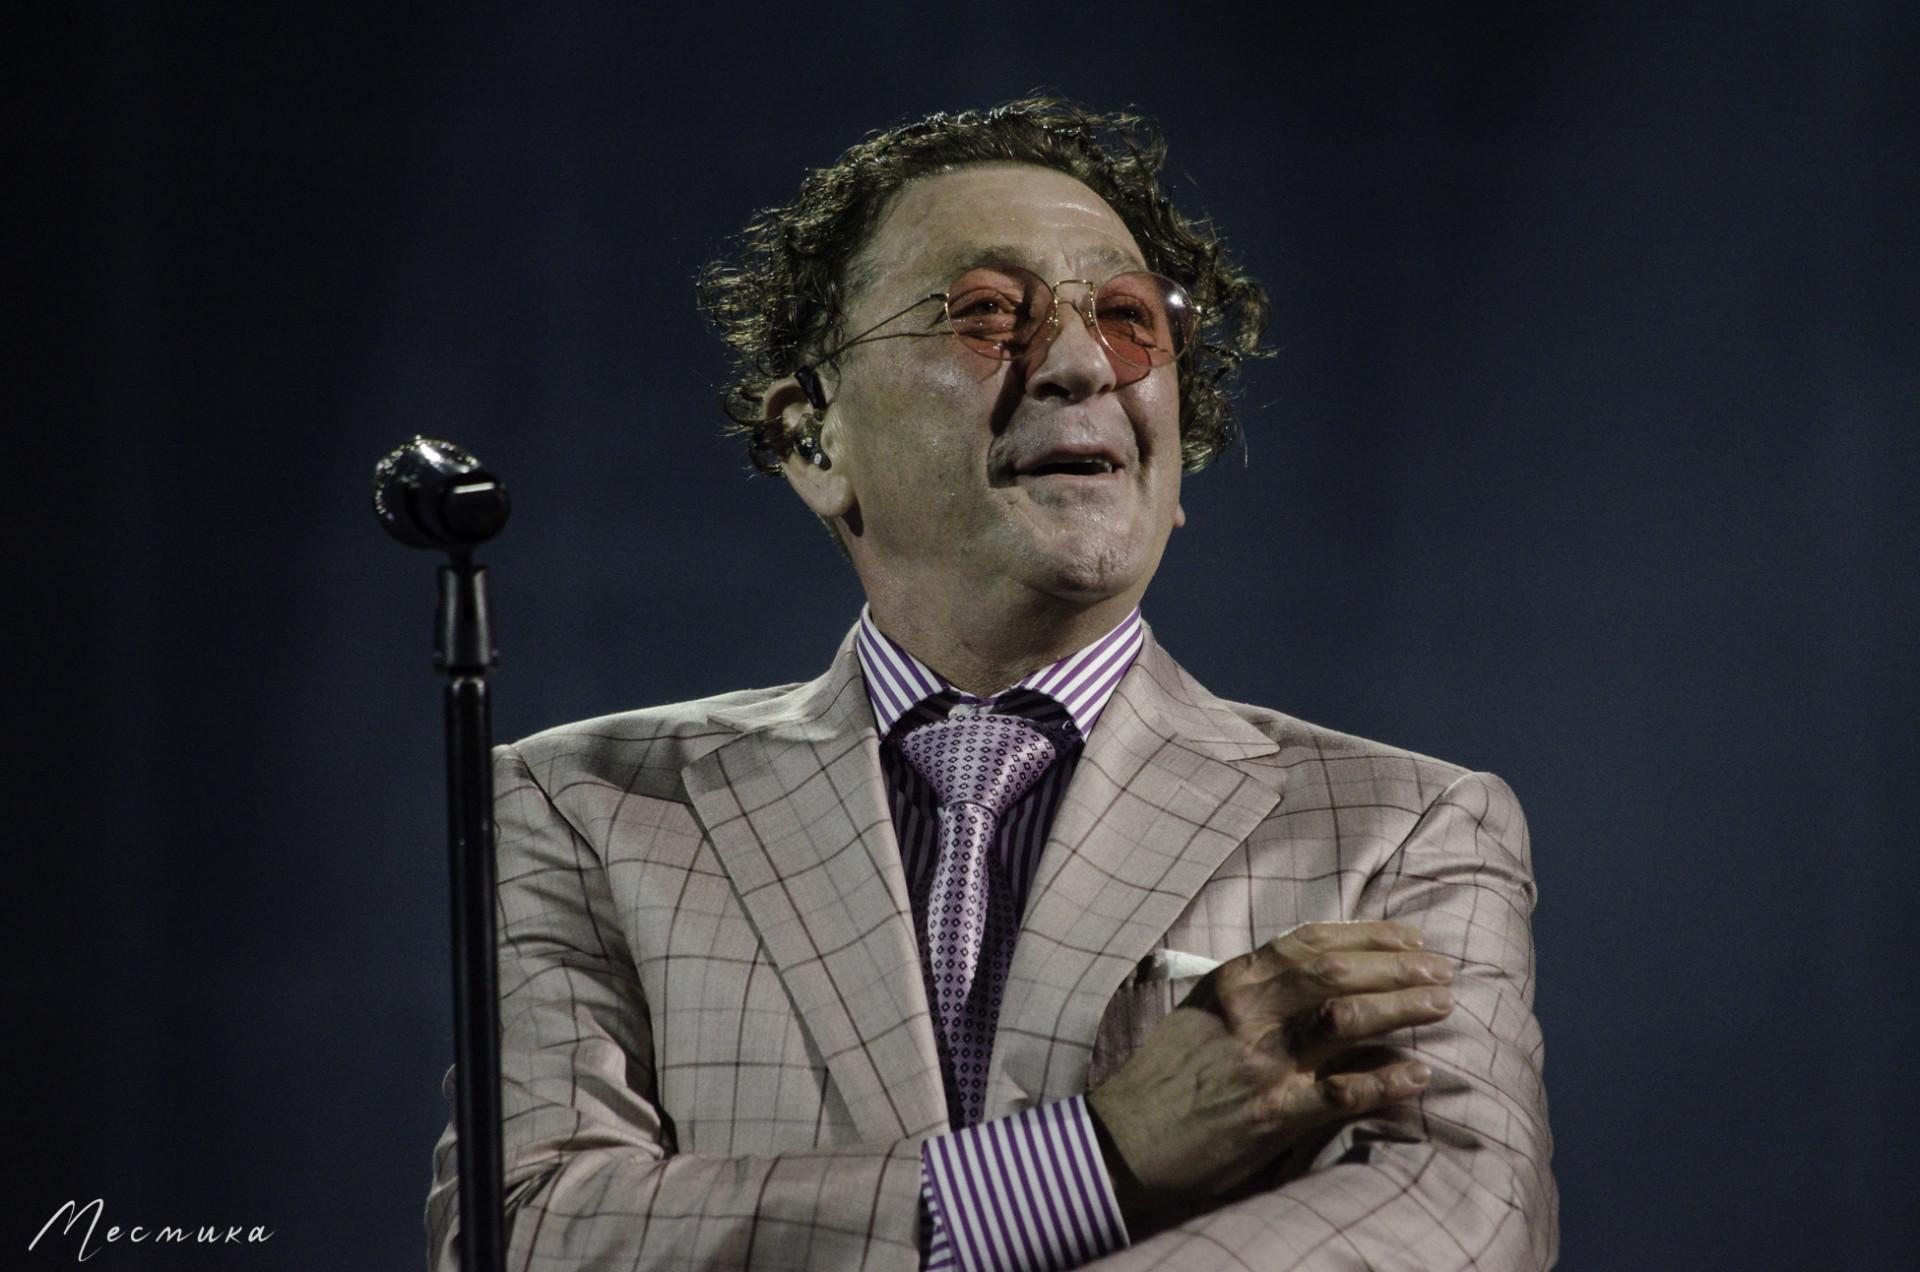 Григорий Лепс на фестивале Белые ночи Санкт-Петербурга 11.07.2021